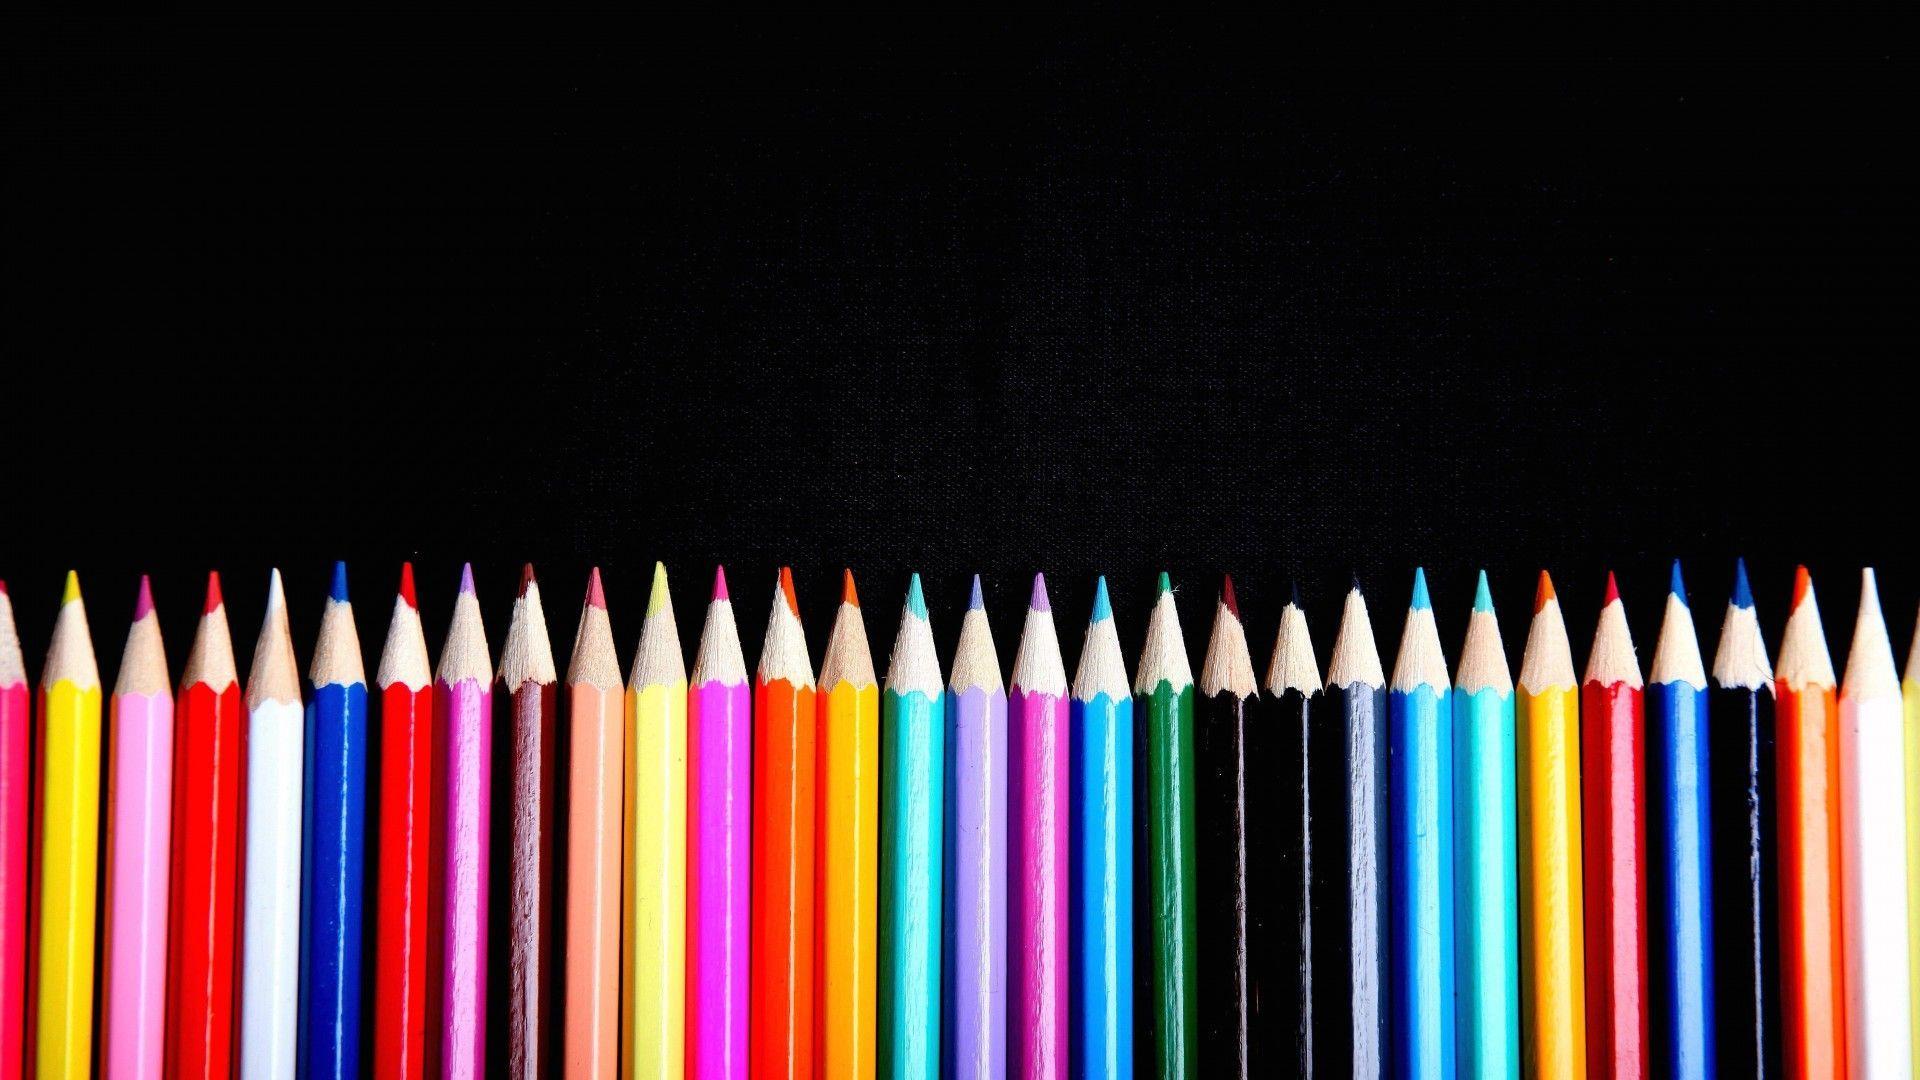 beautiful pencil images